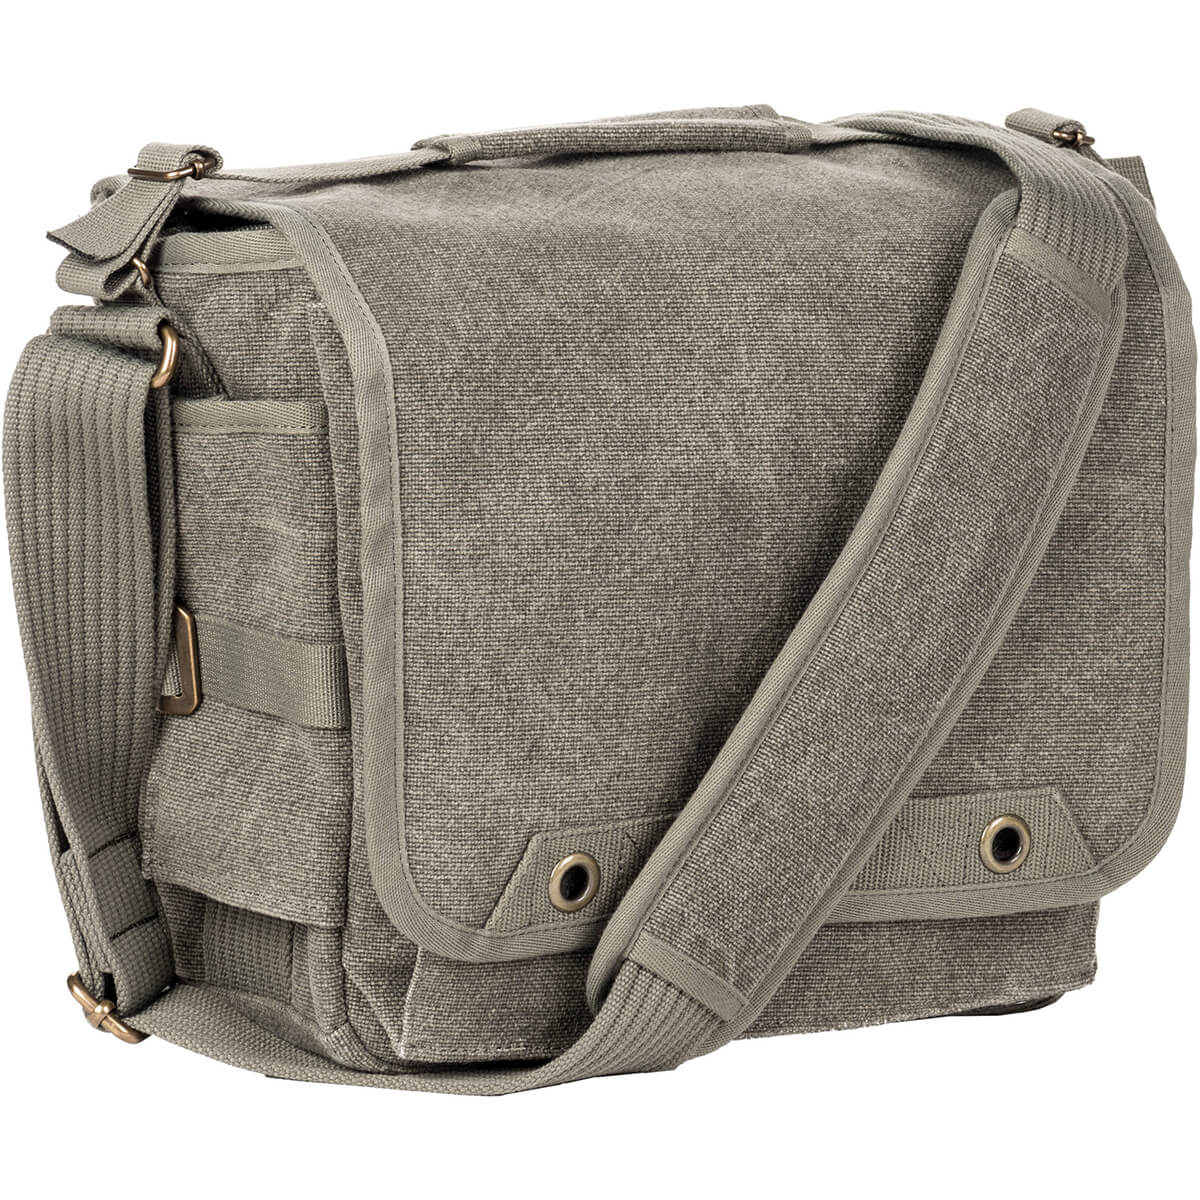 Best Camera Backpacks for Travel - Think Tank Retrospective 30